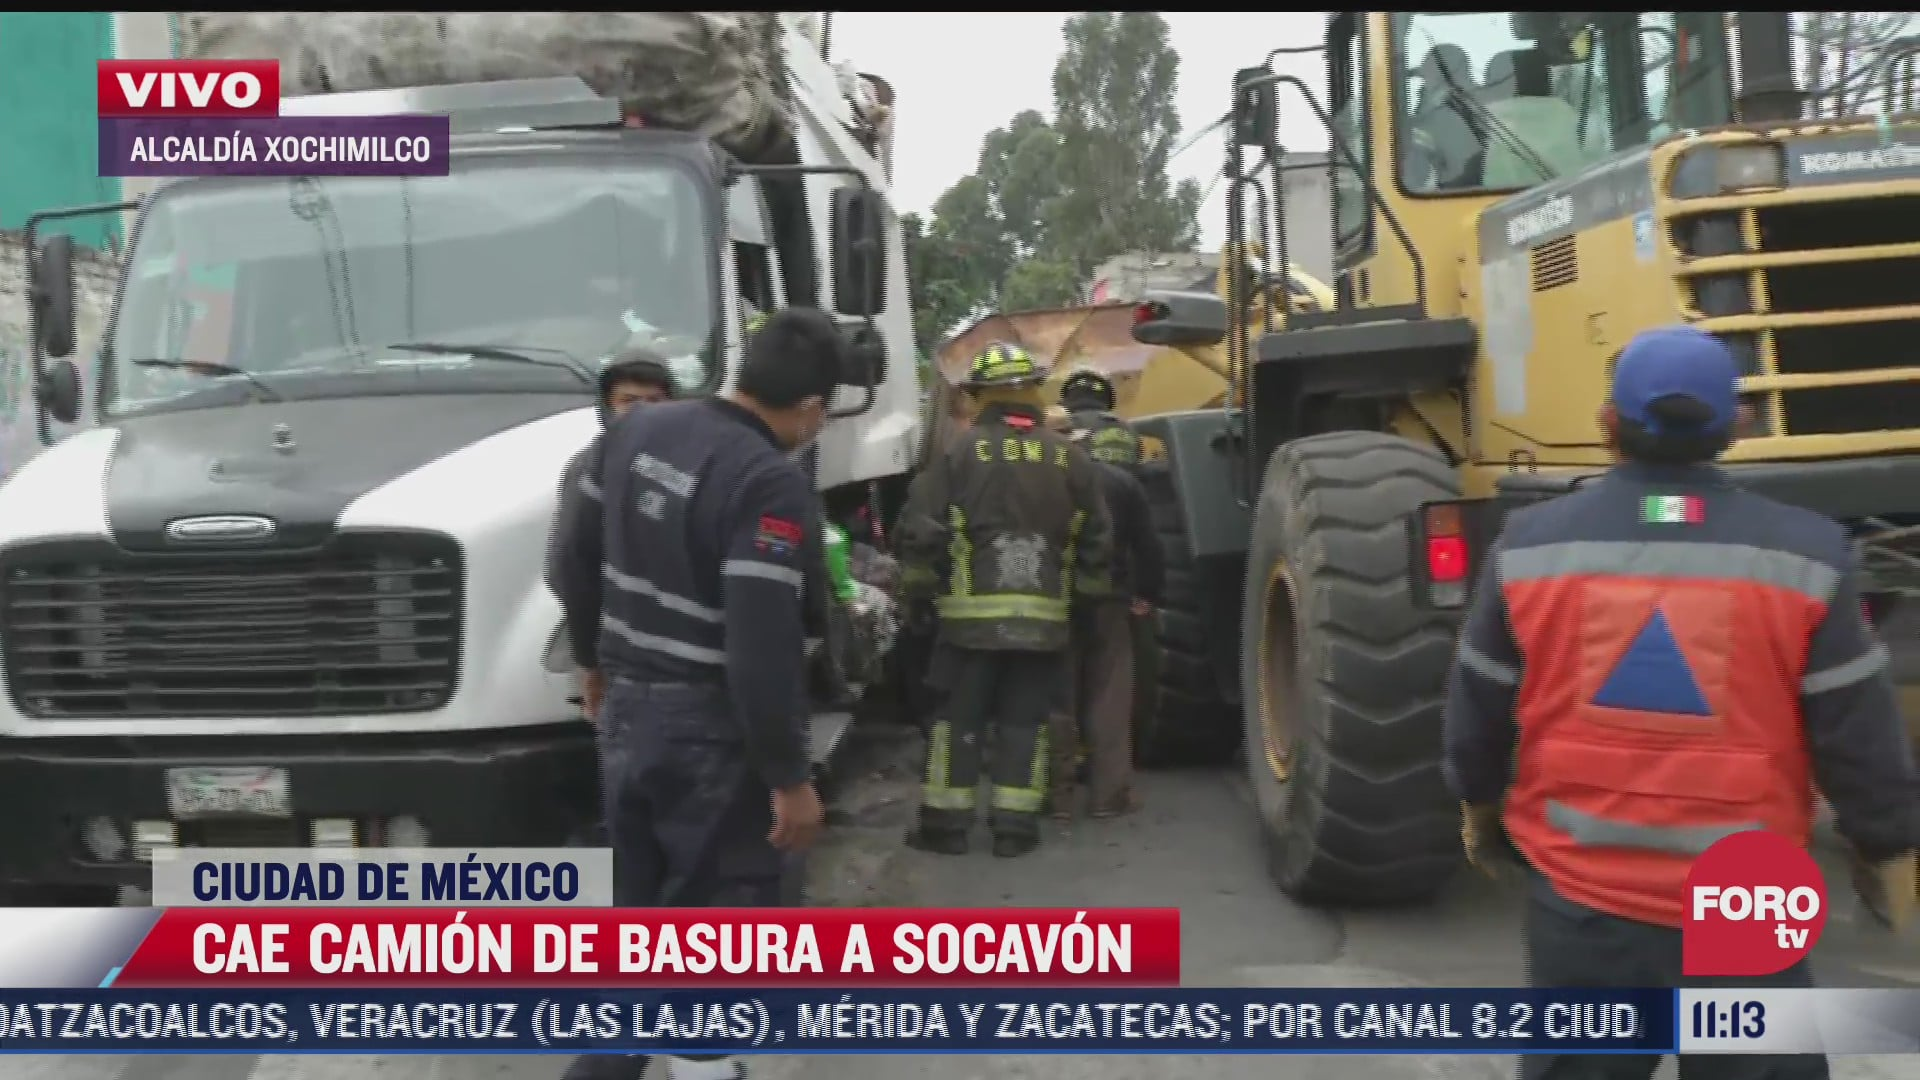 camion de basura cae a socavon en la alcaldia xochimilco cdmx